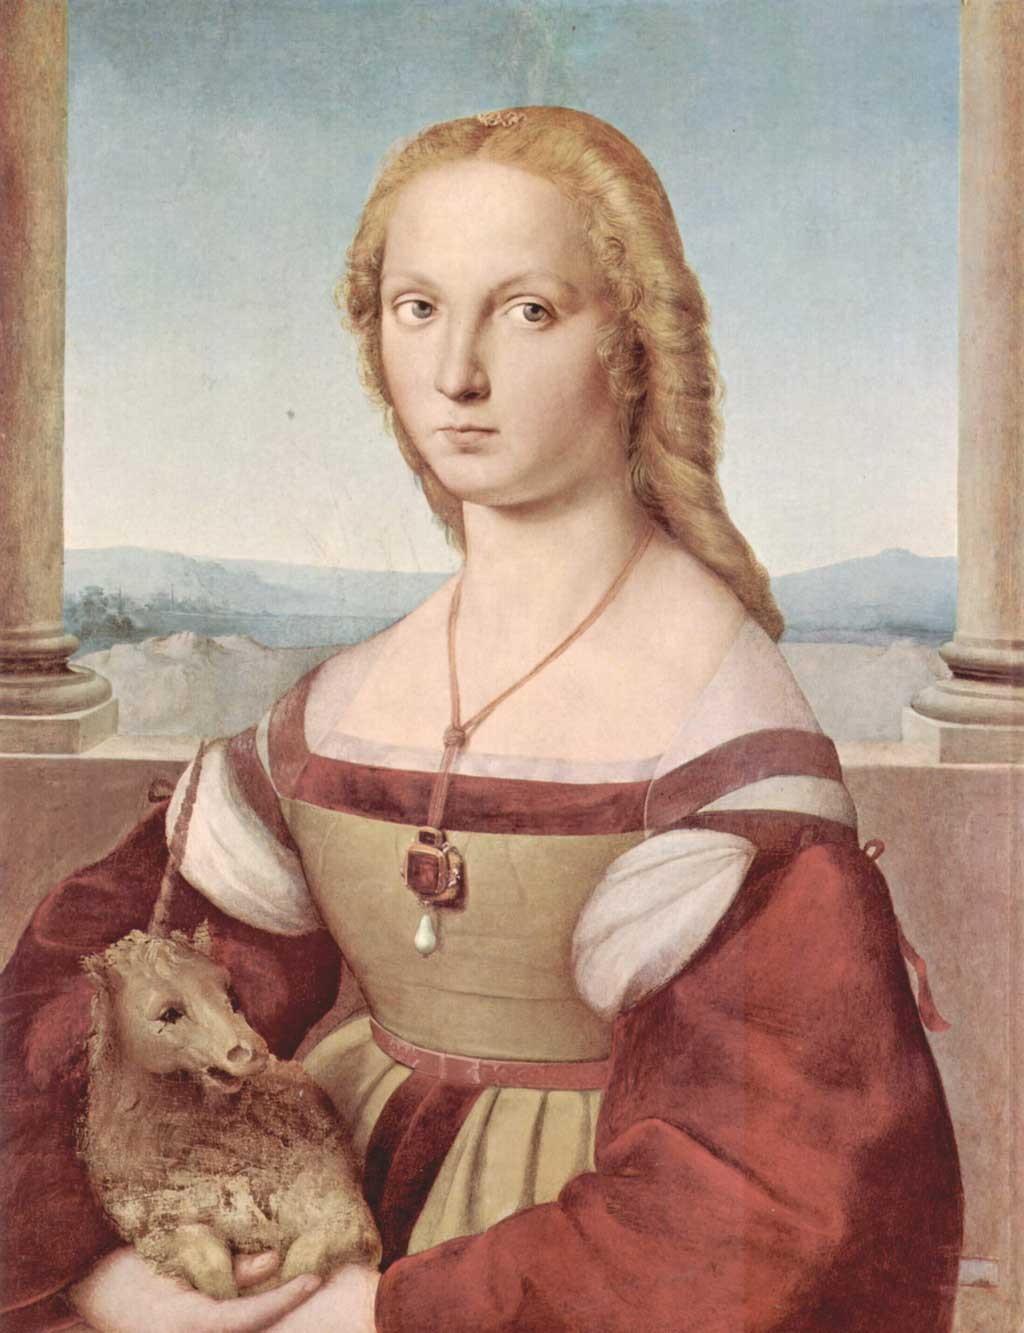 Галерея Боргезе, музеи Рима, рафаель санти, картины рафаеля, дама с единорогом